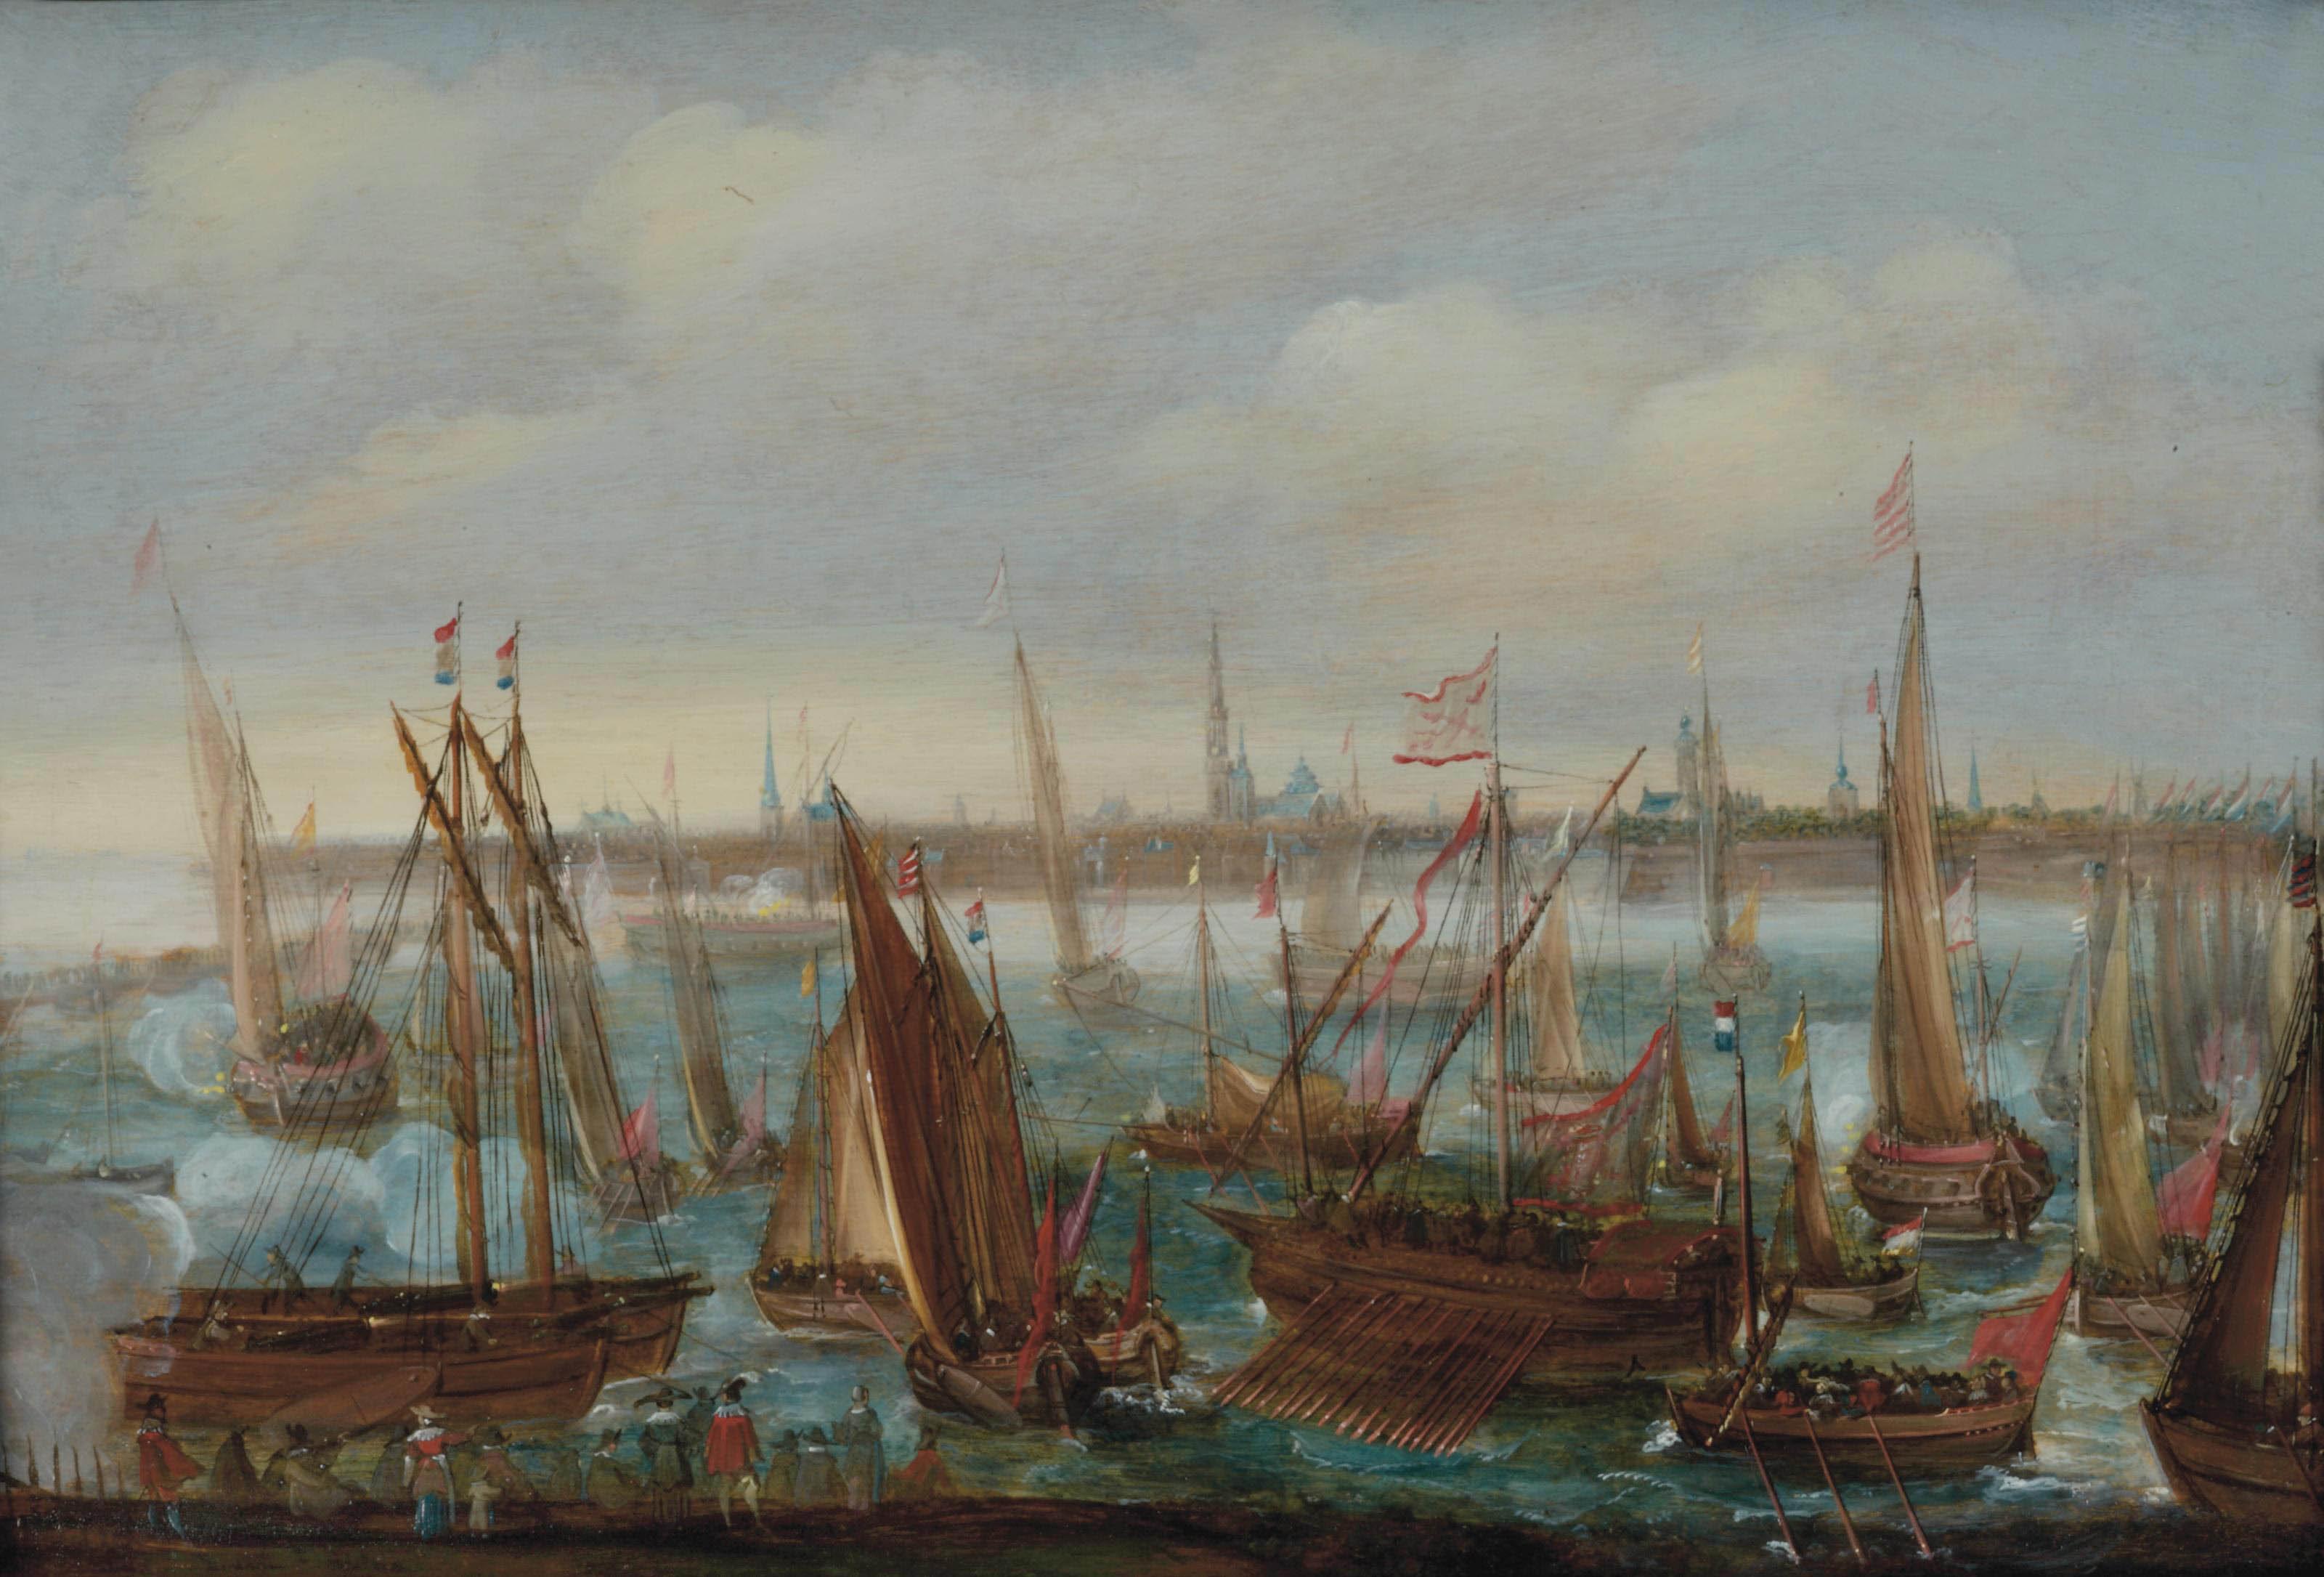 Attributed to Bonaventura Peeters I (Antwerp 1614-1652 Hoboken)